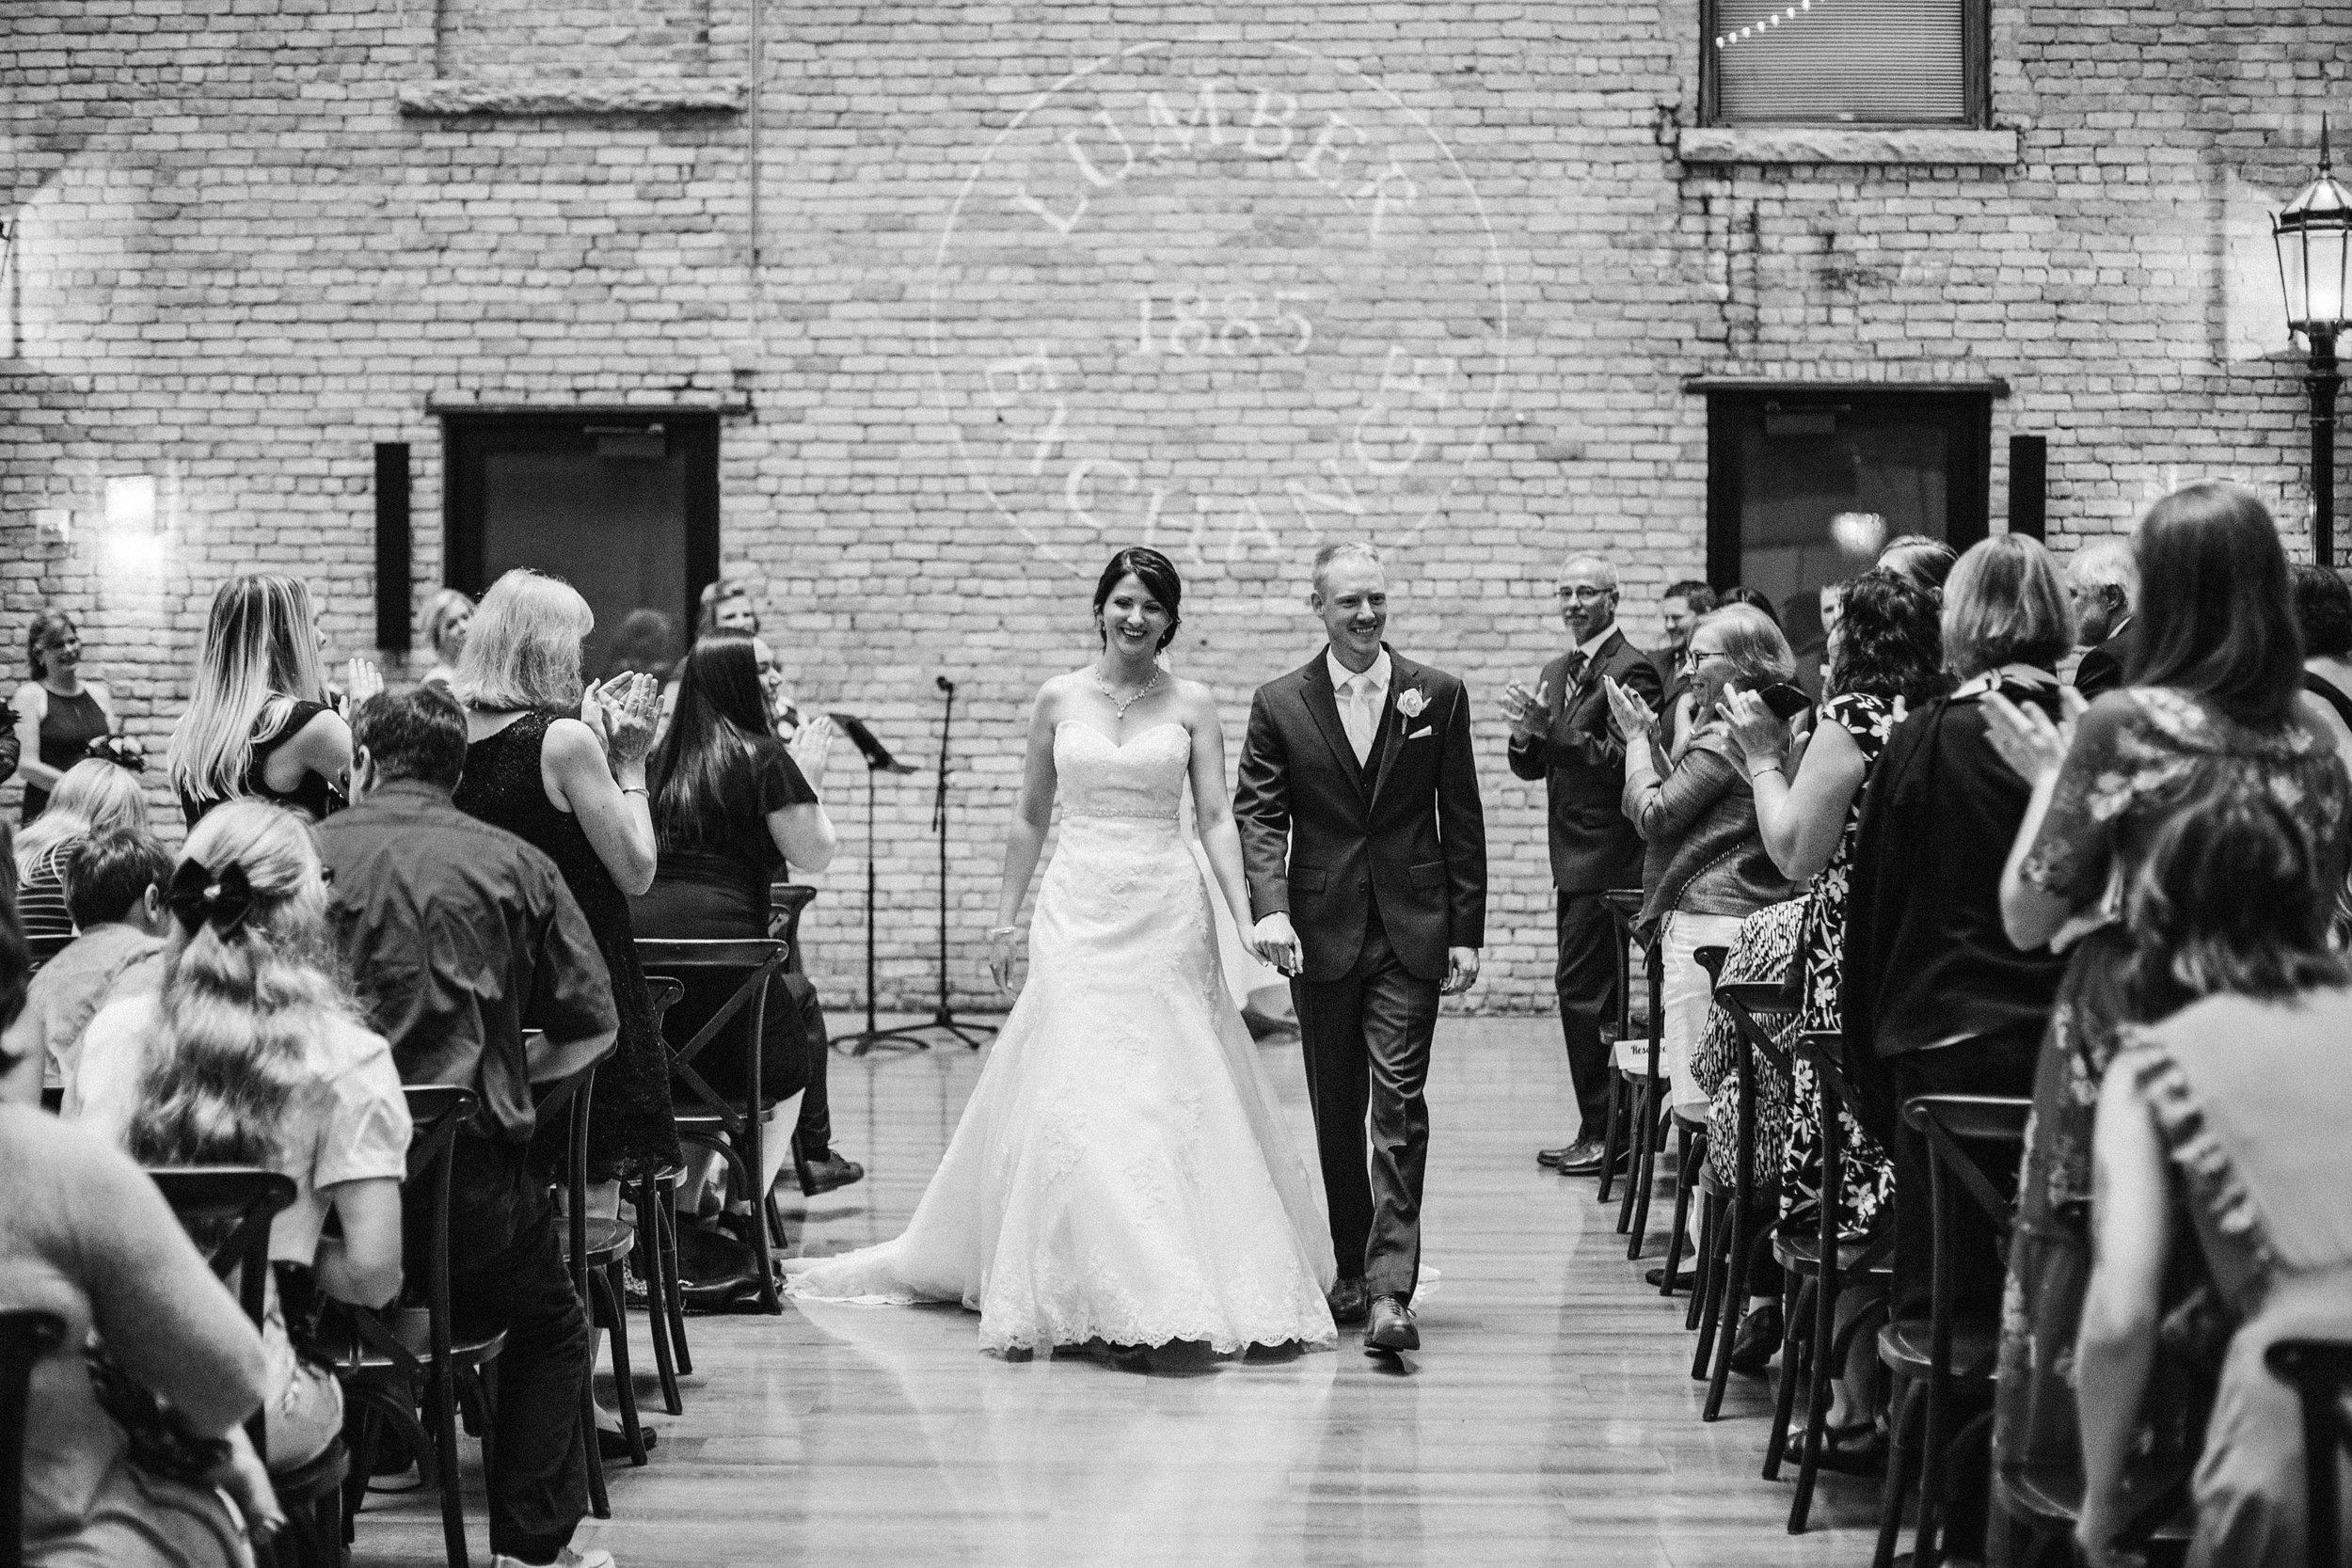 CourtneyIan_Wedding_Preview_0050.jpg